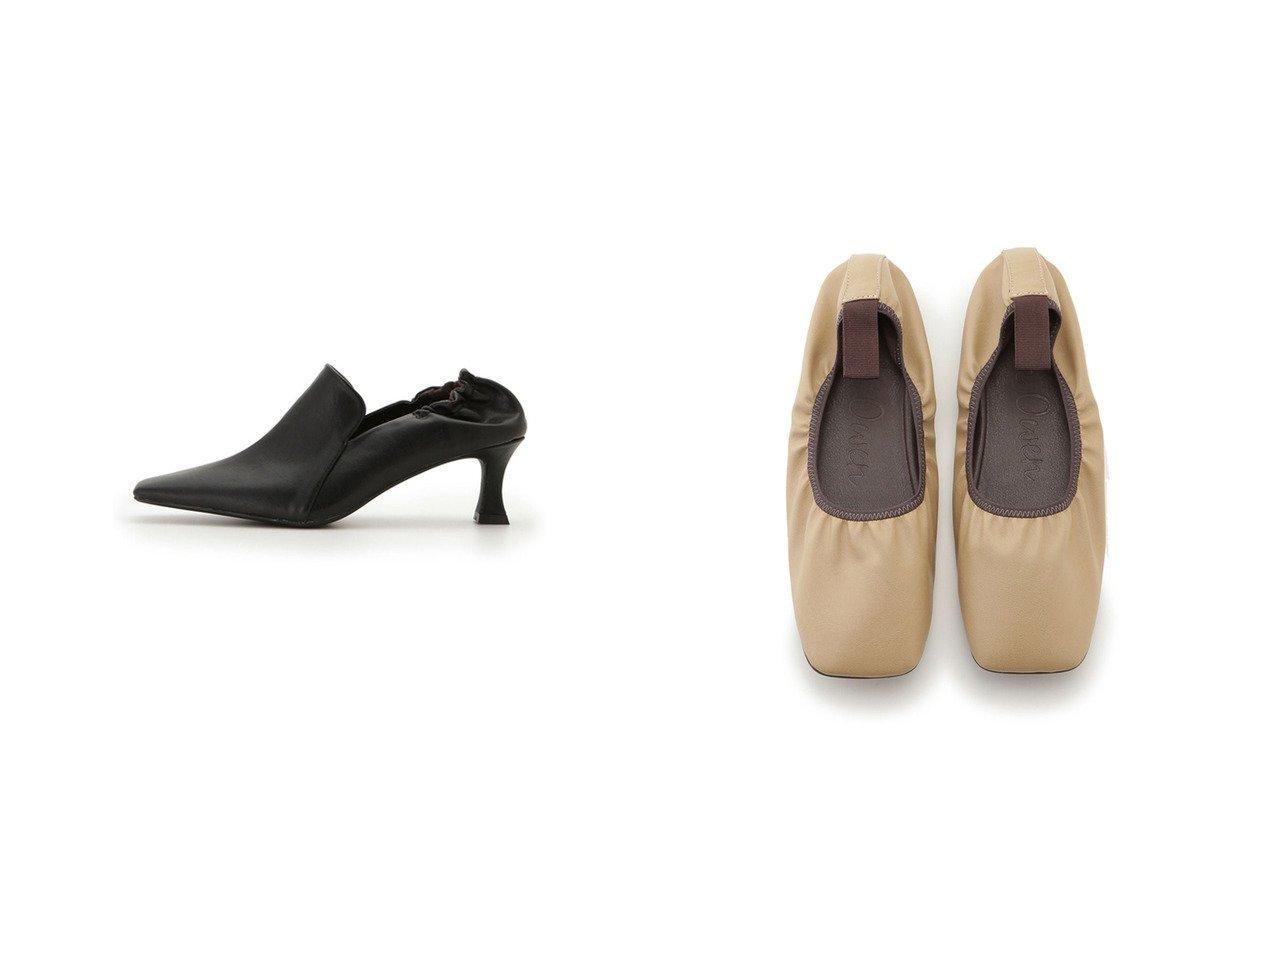 【Mila Owen/ミラオーウェン】のバッグギャザーオペラパンプス&履き口ゴムソフトバレエシューズ シューズ・靴のおすすめ!人気、トレンド・レディースファッションの通販 おすすめで人気の流行・トレンド、ファッションの通販商品 メンズファッション・キッズファッション・インテリア・家具・レディースファッション・服の通販 founy(ファニー) https://founy.com/ ファッション Fashion レディースファッション WOMEN グログラン シューズ ストレッチ バレエ フェイクレザー フラット バランス フィット フレア 春 Spring |ID:crp329100000014466